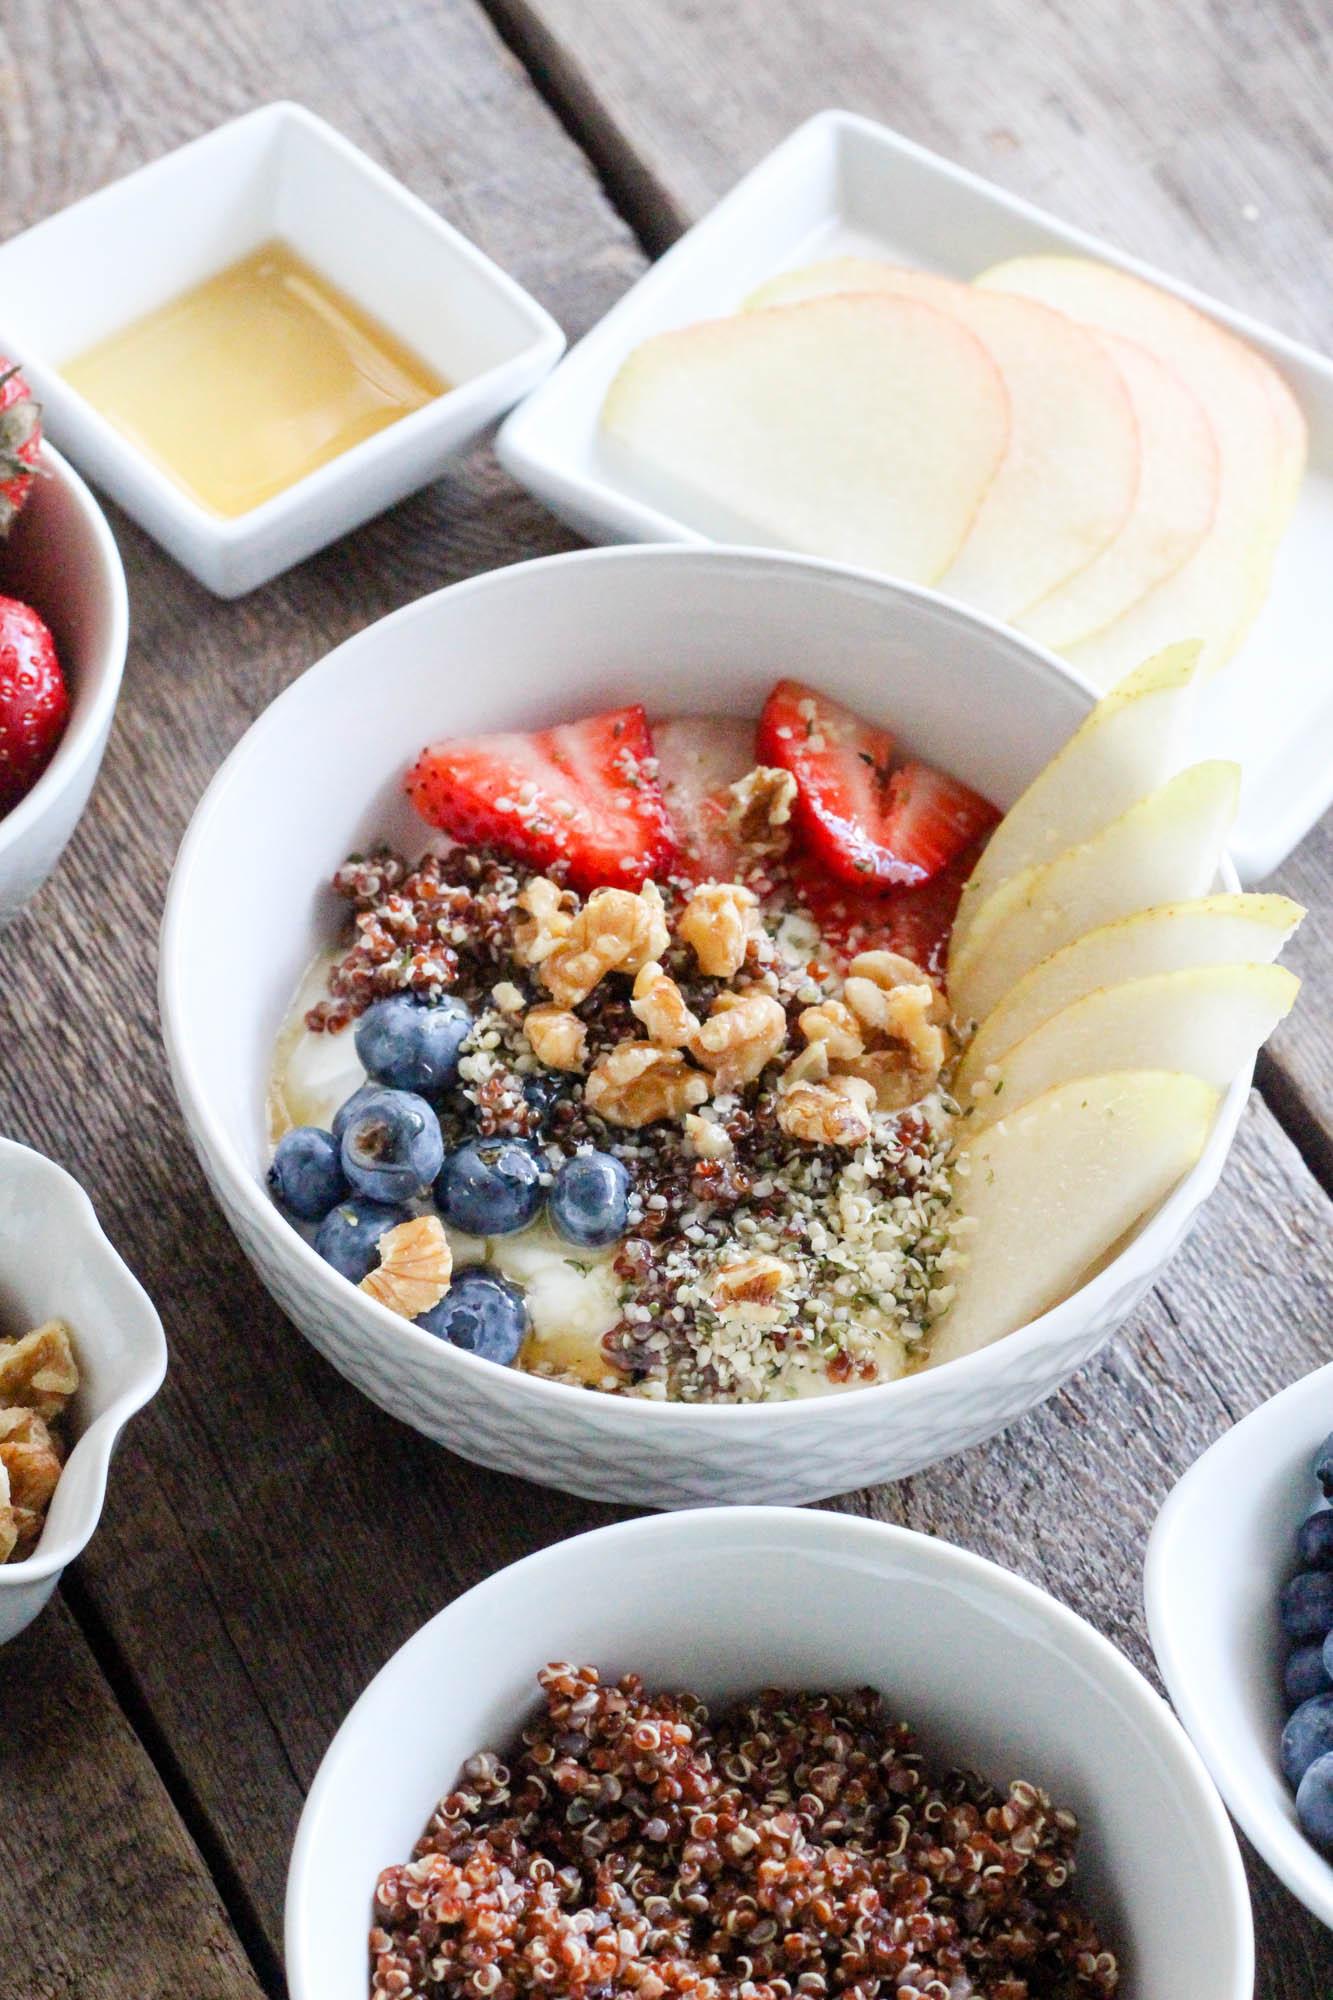 red-quinoa-hemp-hearts-fruit-smoothie-bowl-28